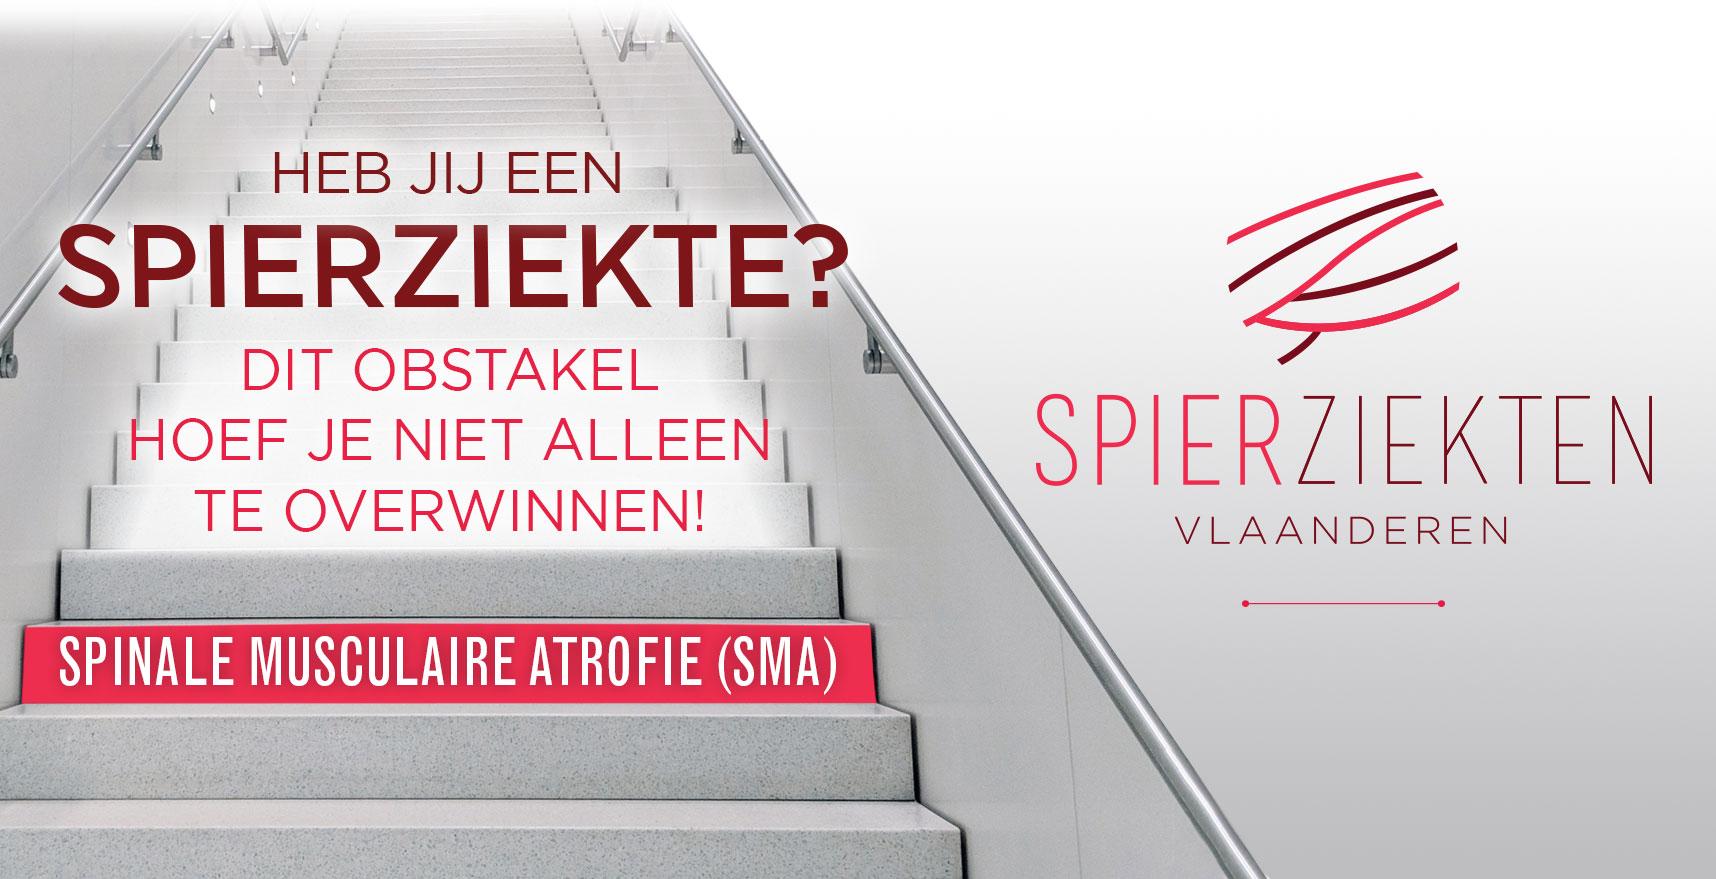 SMA-Belgium Spinale musculaire atrofie (SMA)